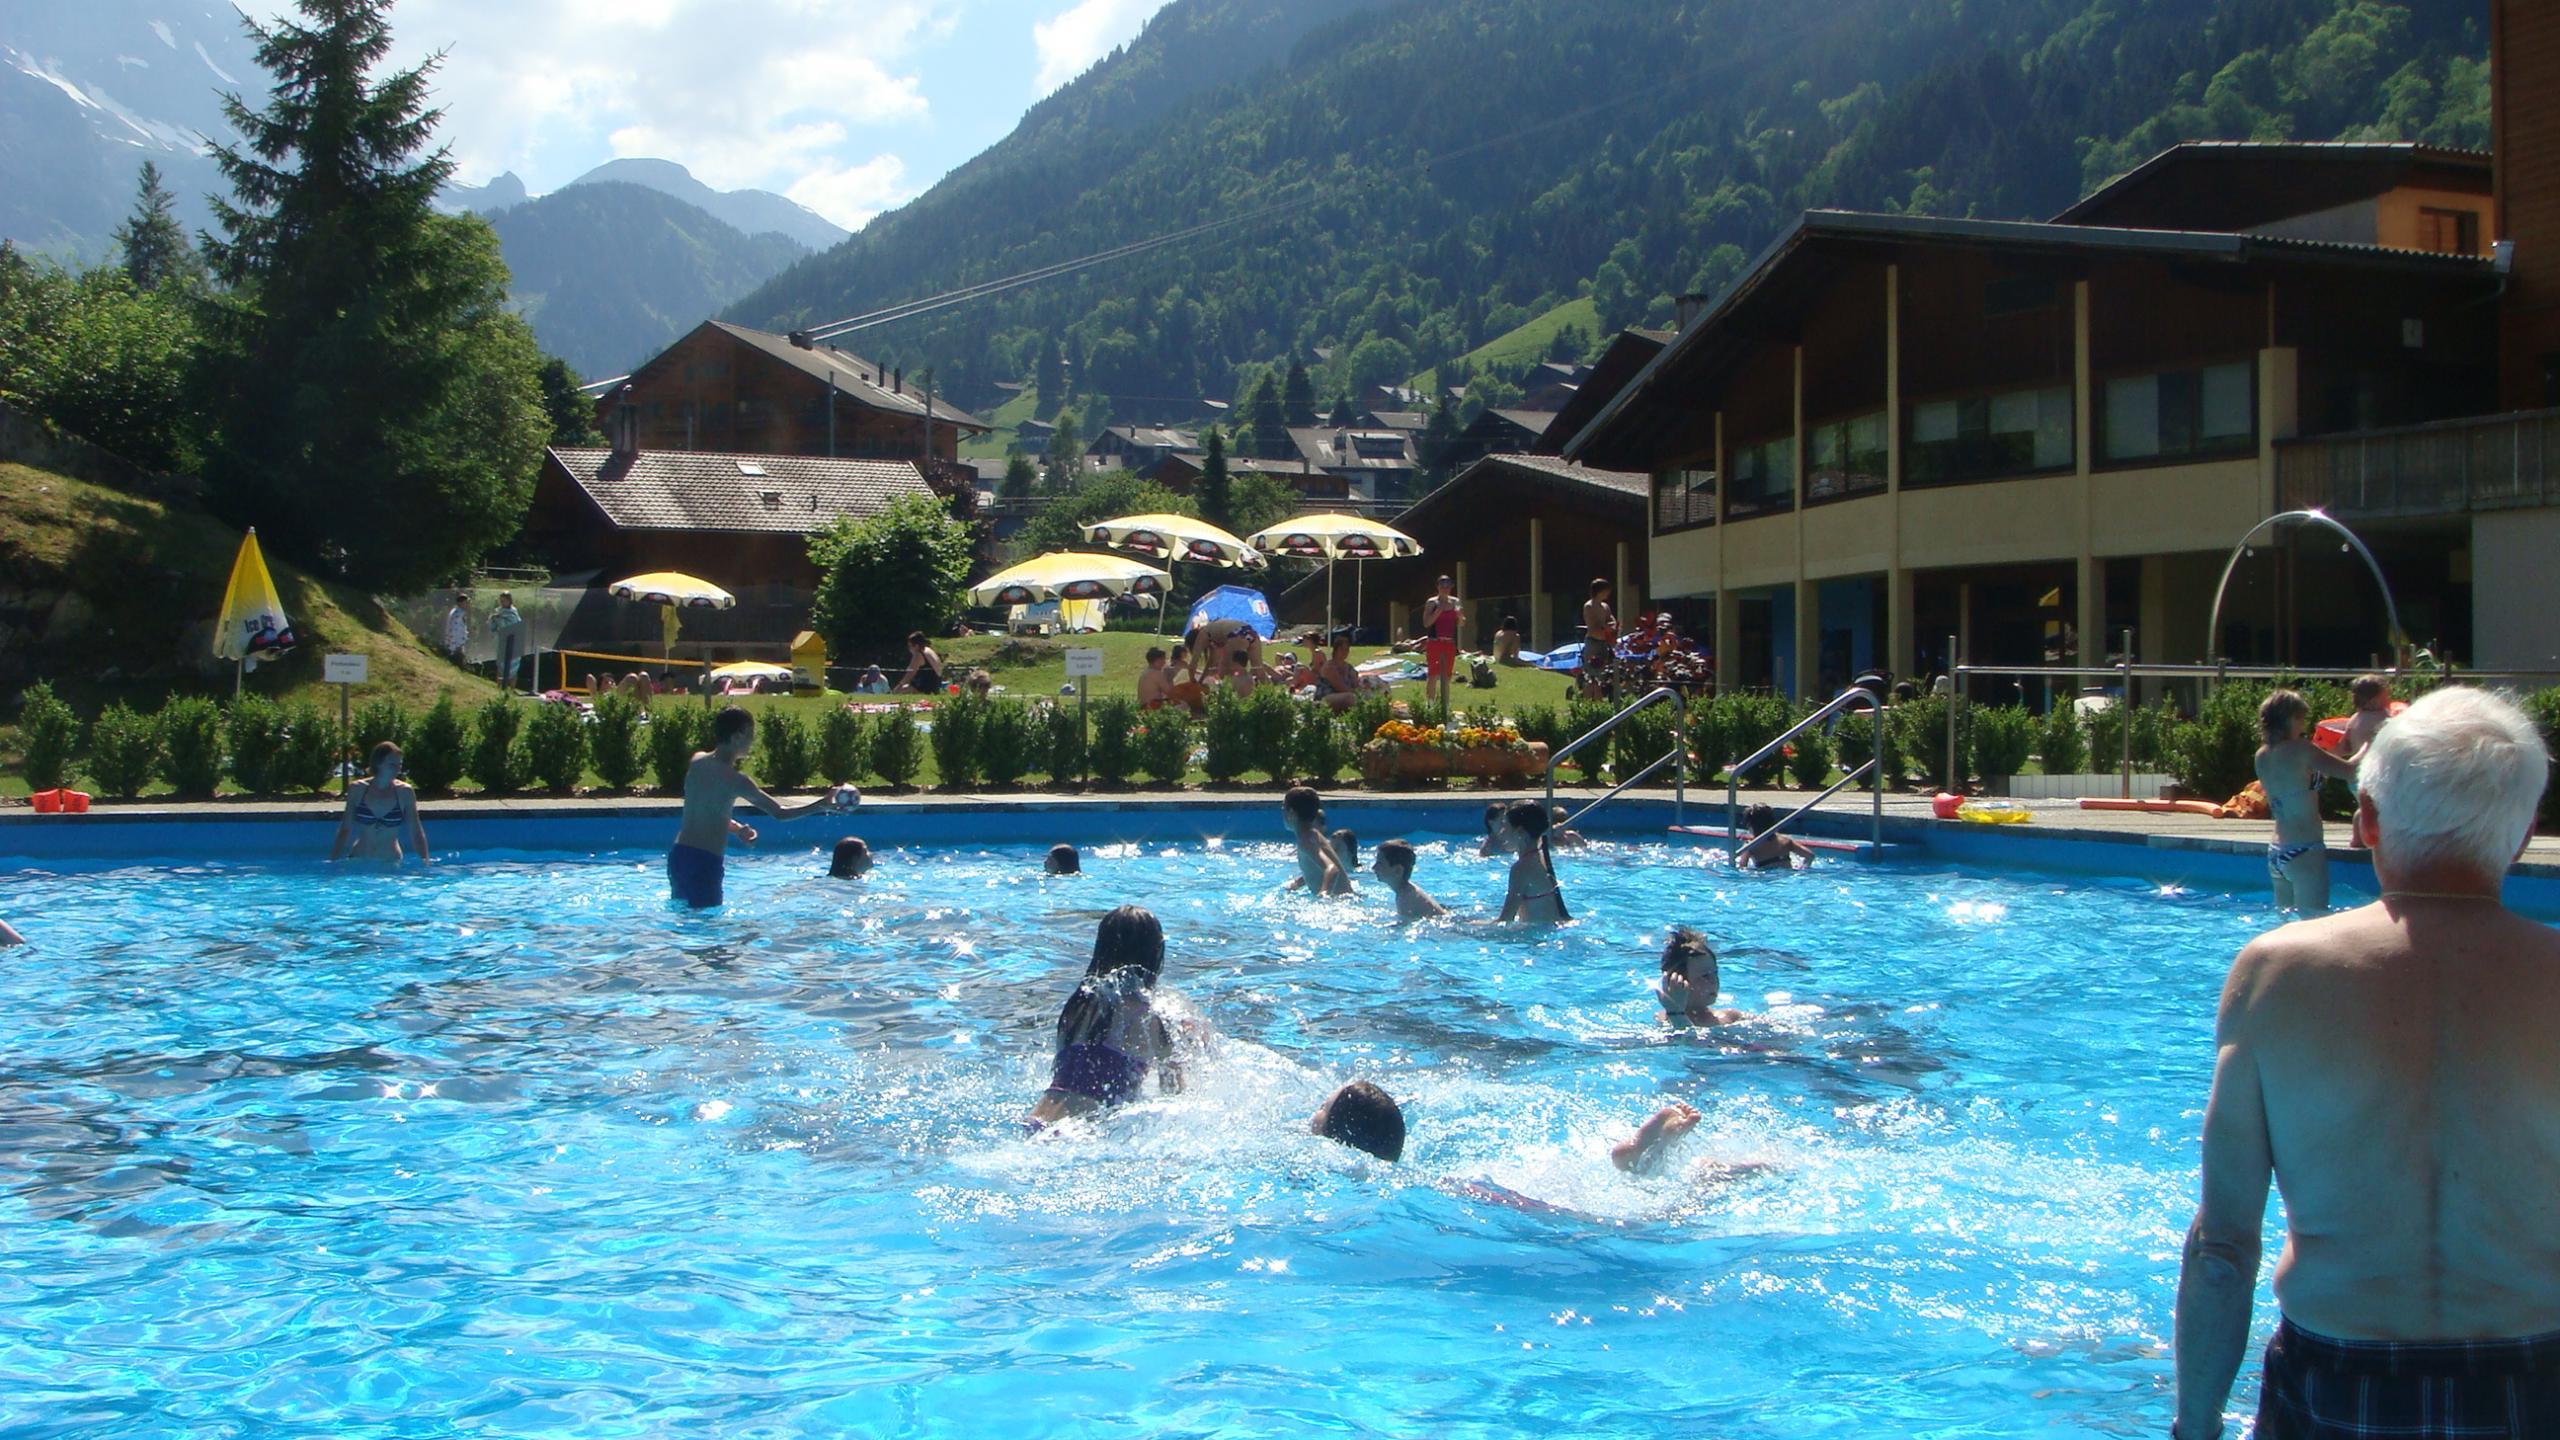 Piscine palladium piscines en plein air couvertes in for Piscine en suisse